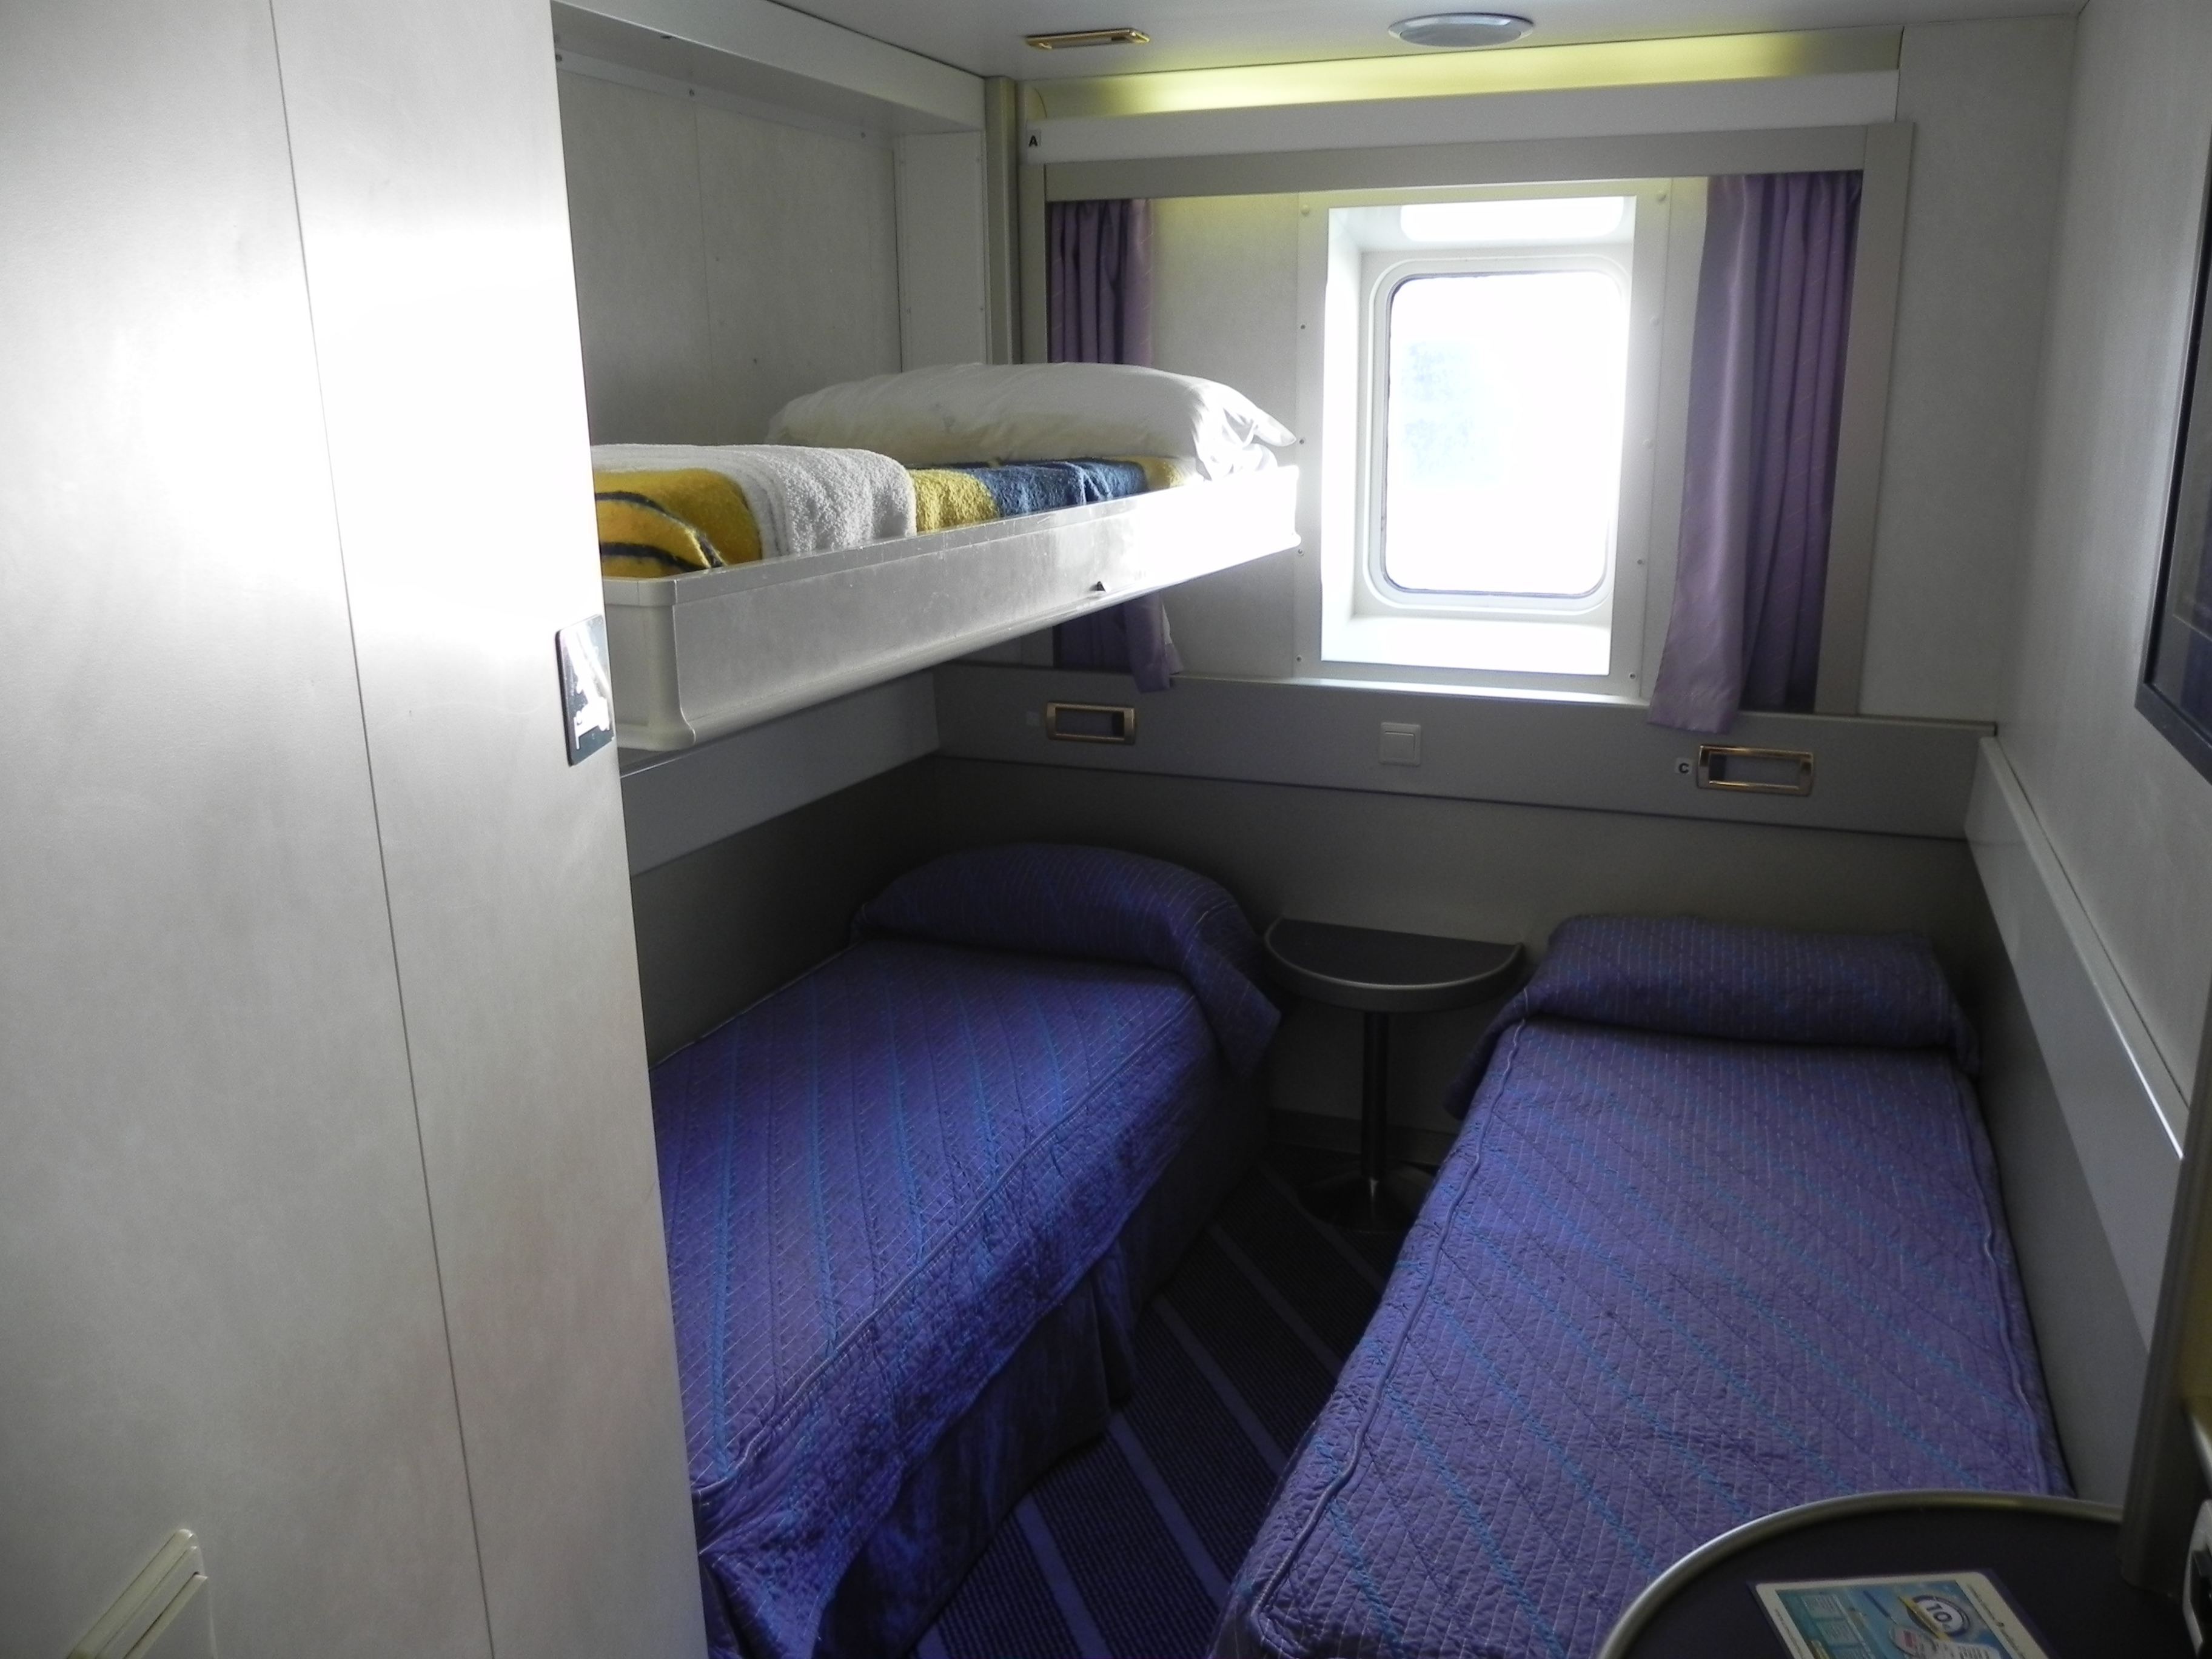 Sardinia ferries mega express 4 blog for La cabina di zio ben